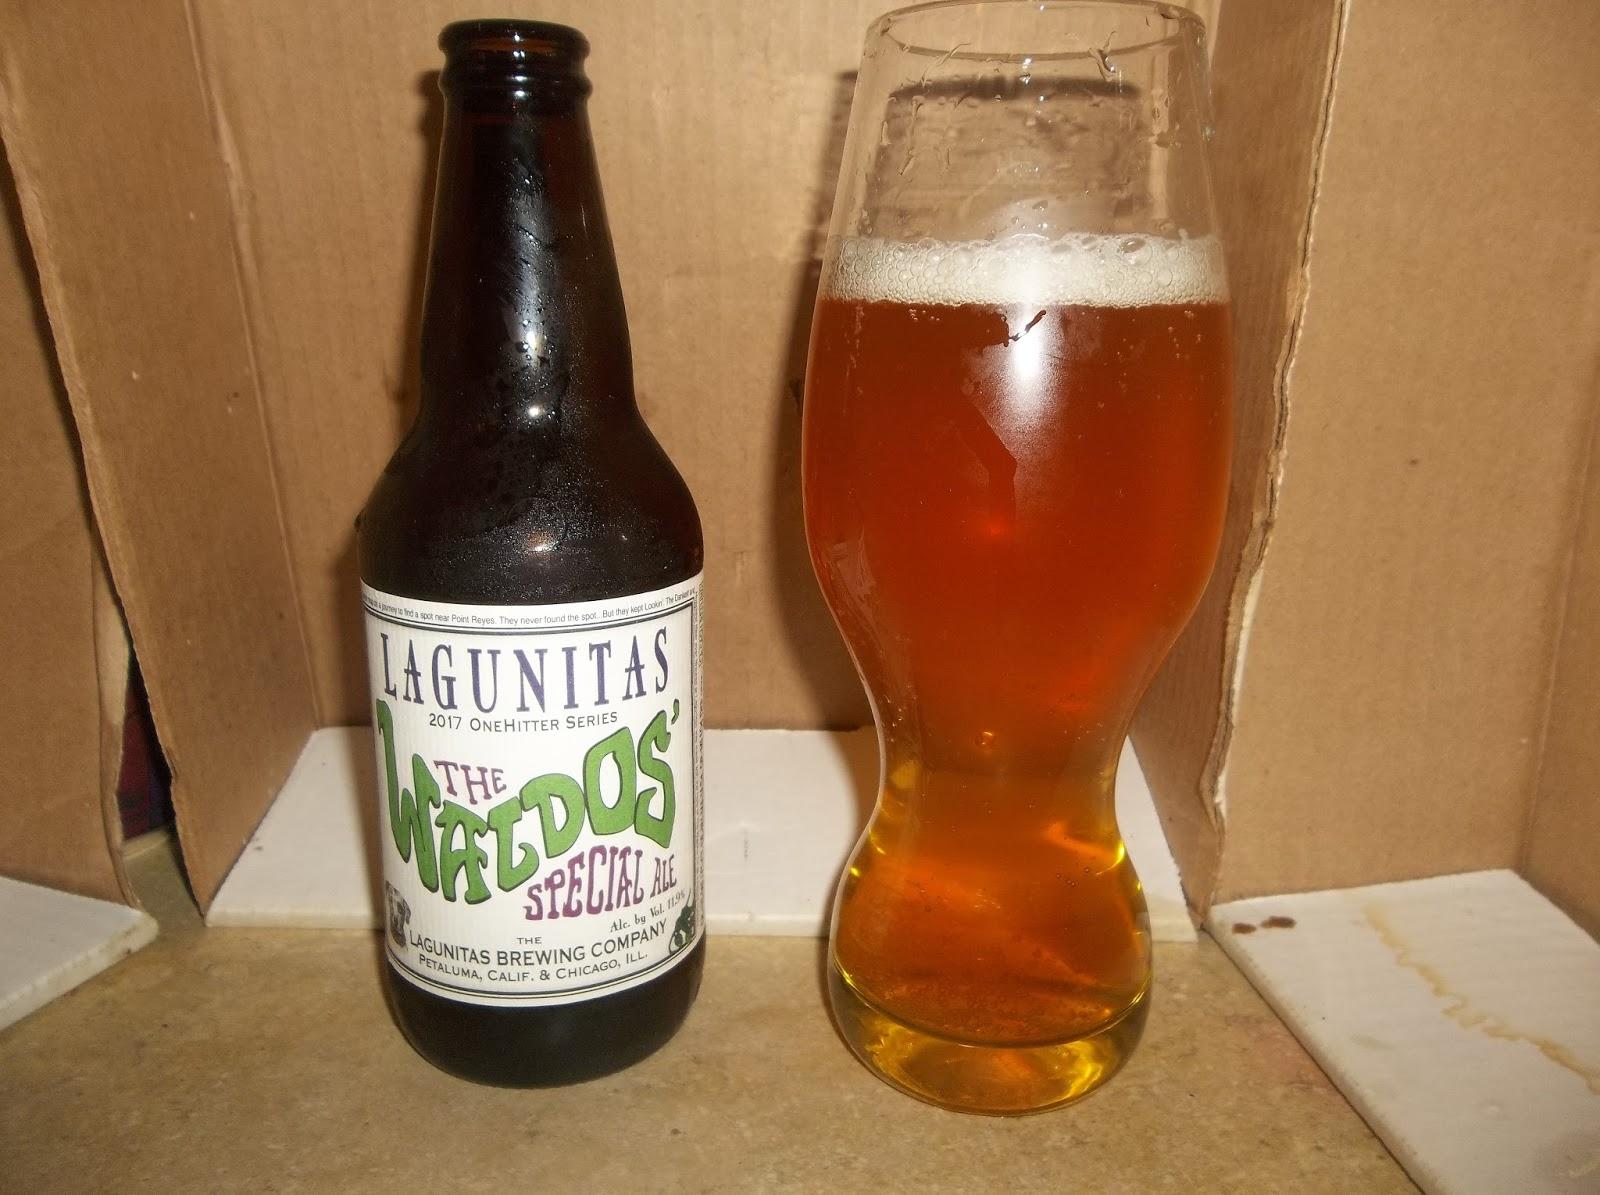 Beer Pimpin' Hobgoblin: Lagunitas The Waldos' Special Ale